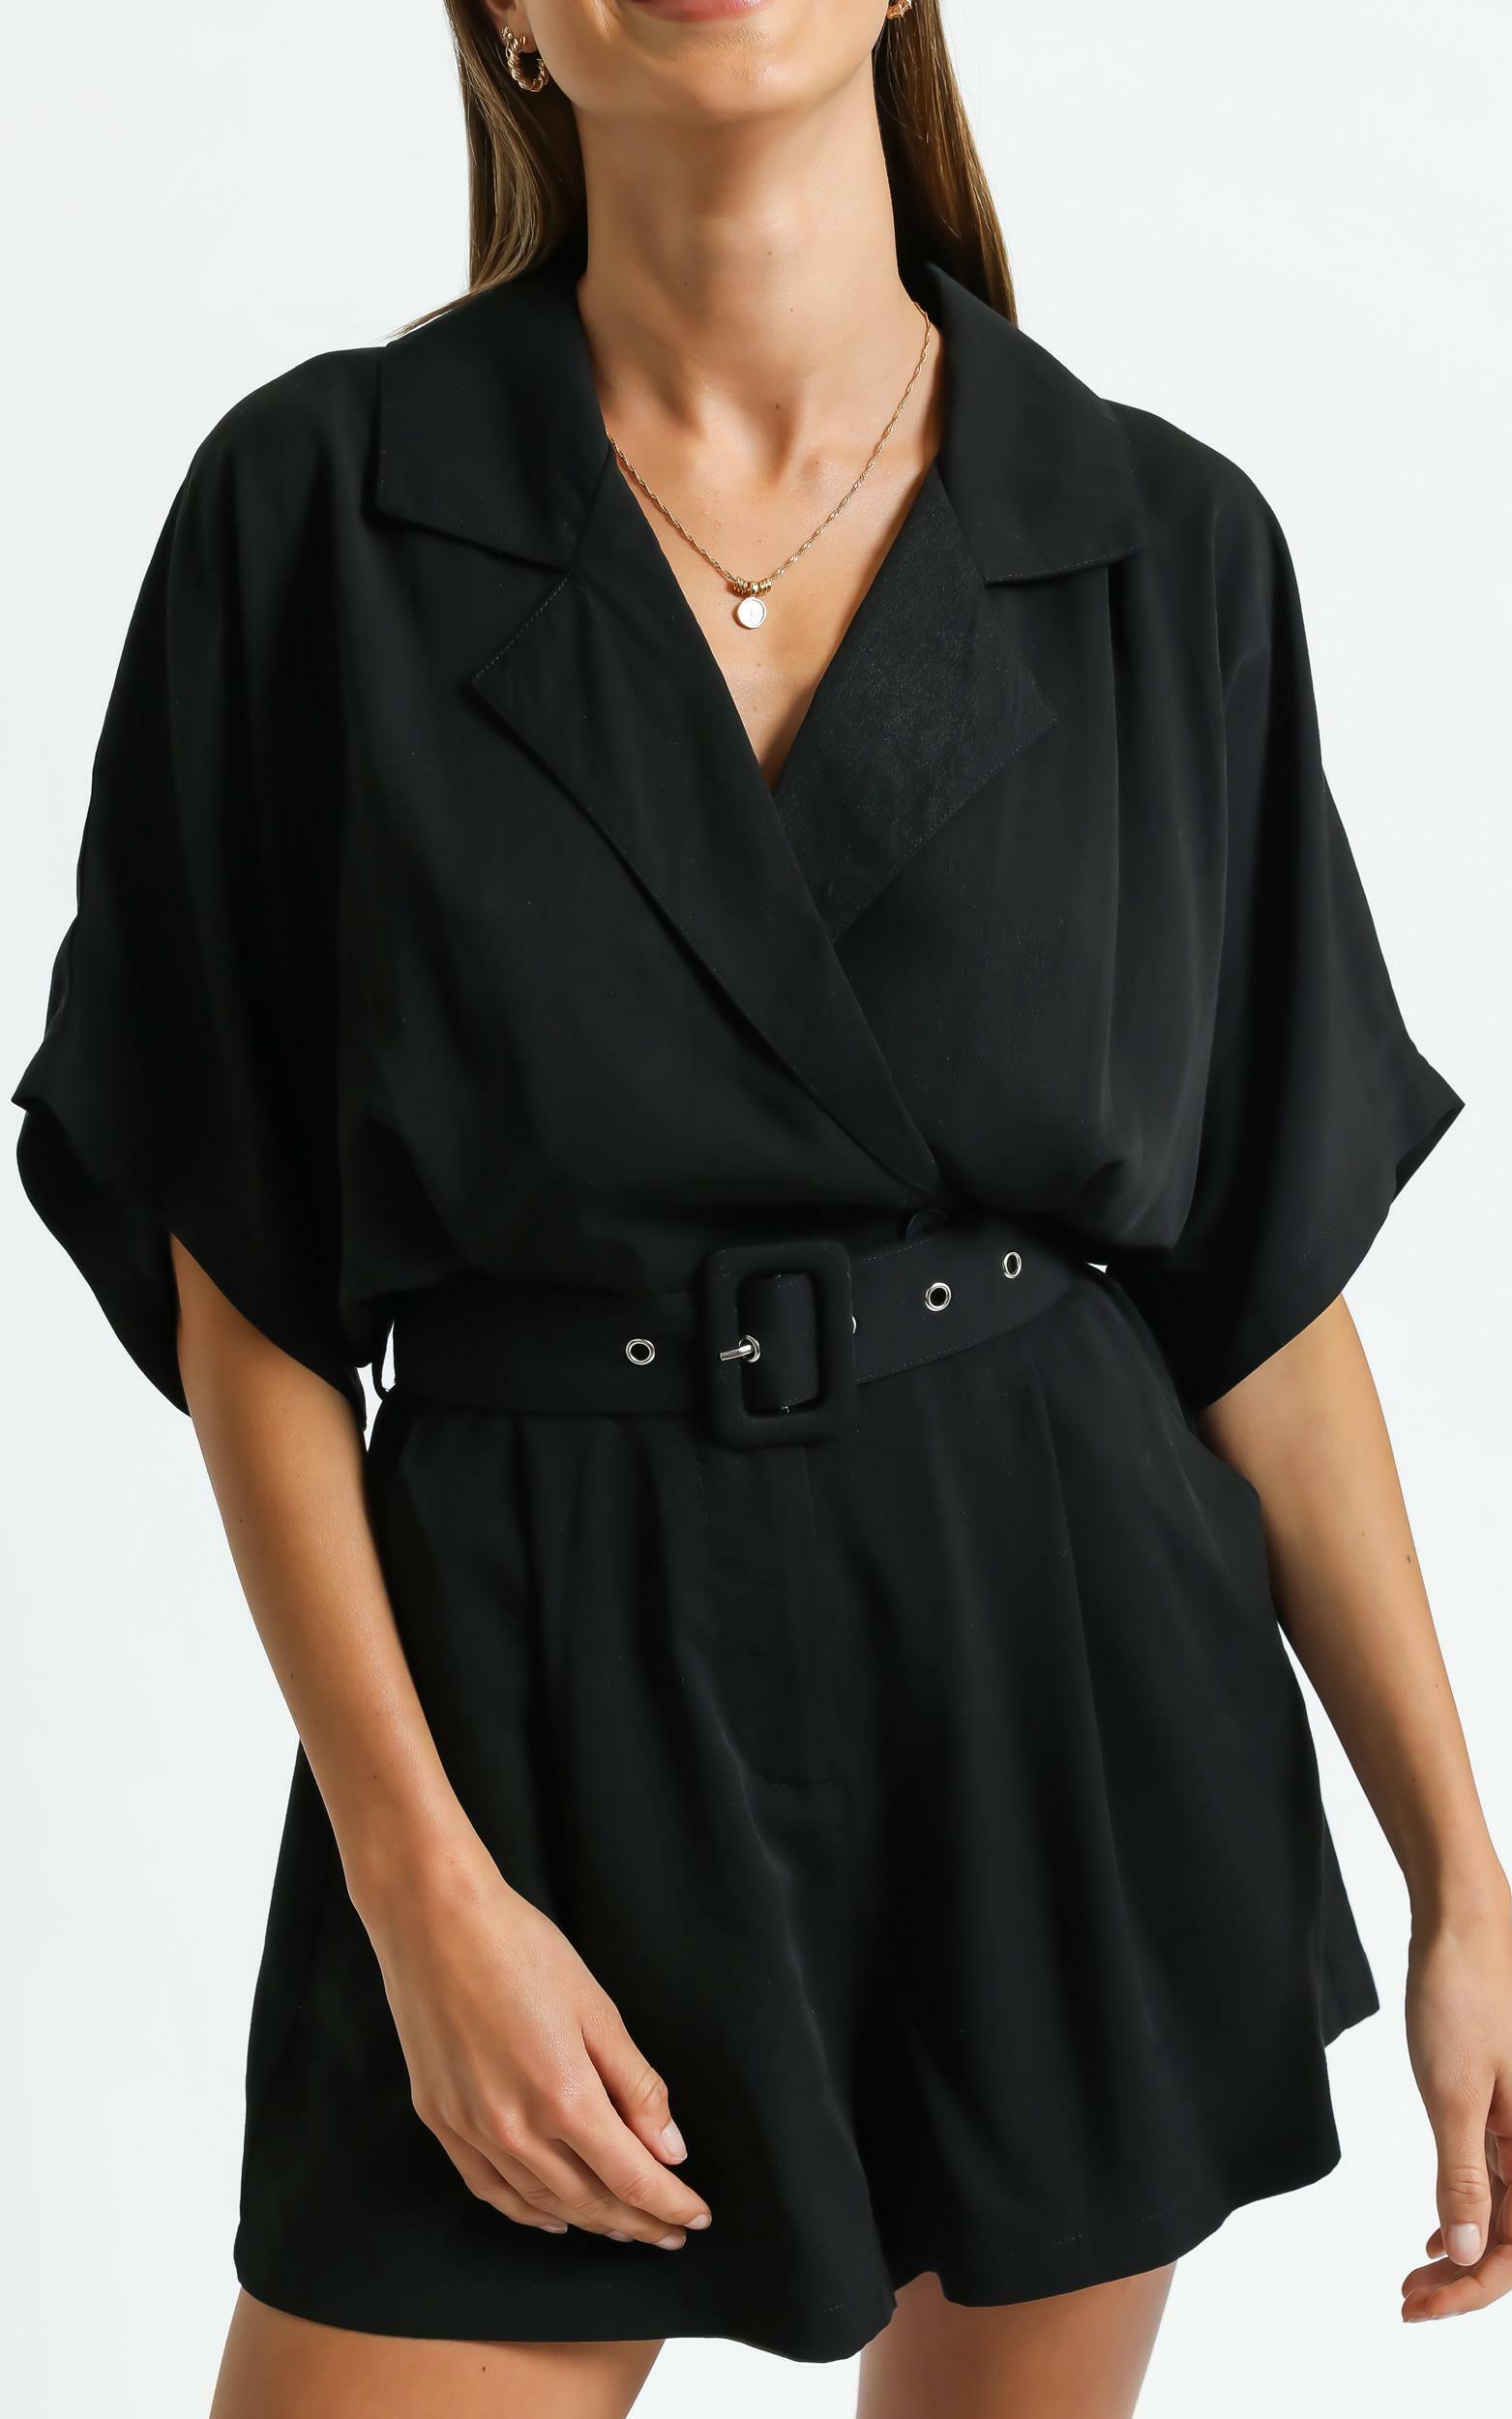 Tonia Playsuit in Black - 06, BLK1, hi-res image number null